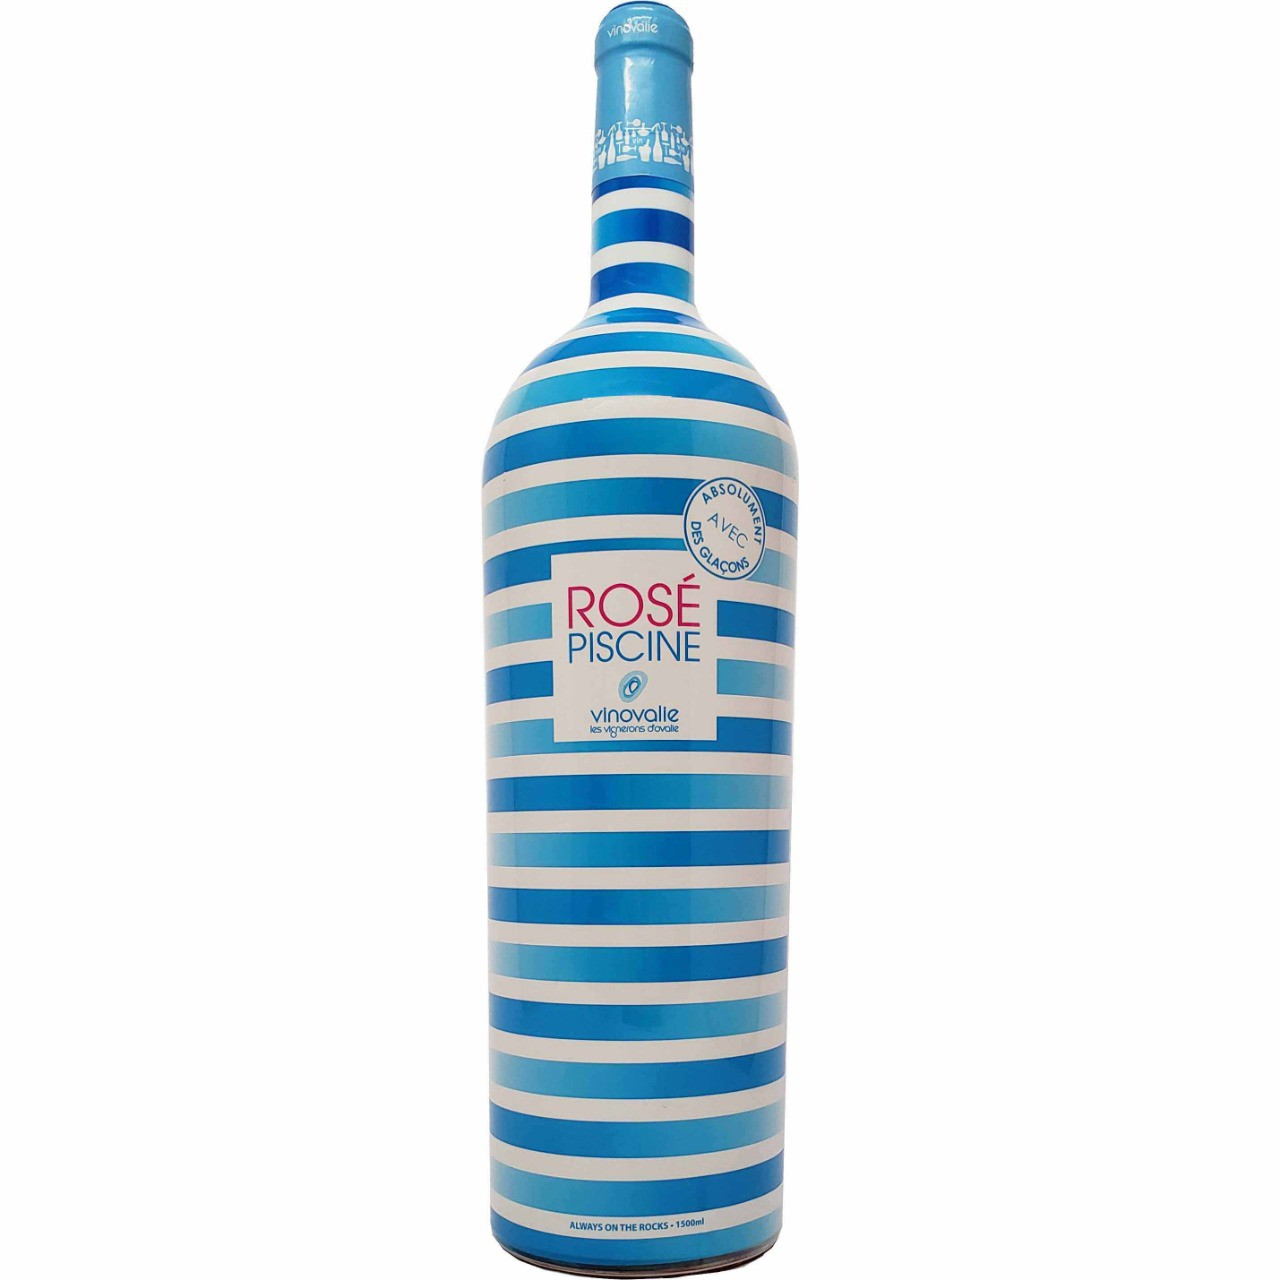 VINHO ROSÉ PISCINE - 1,5L -